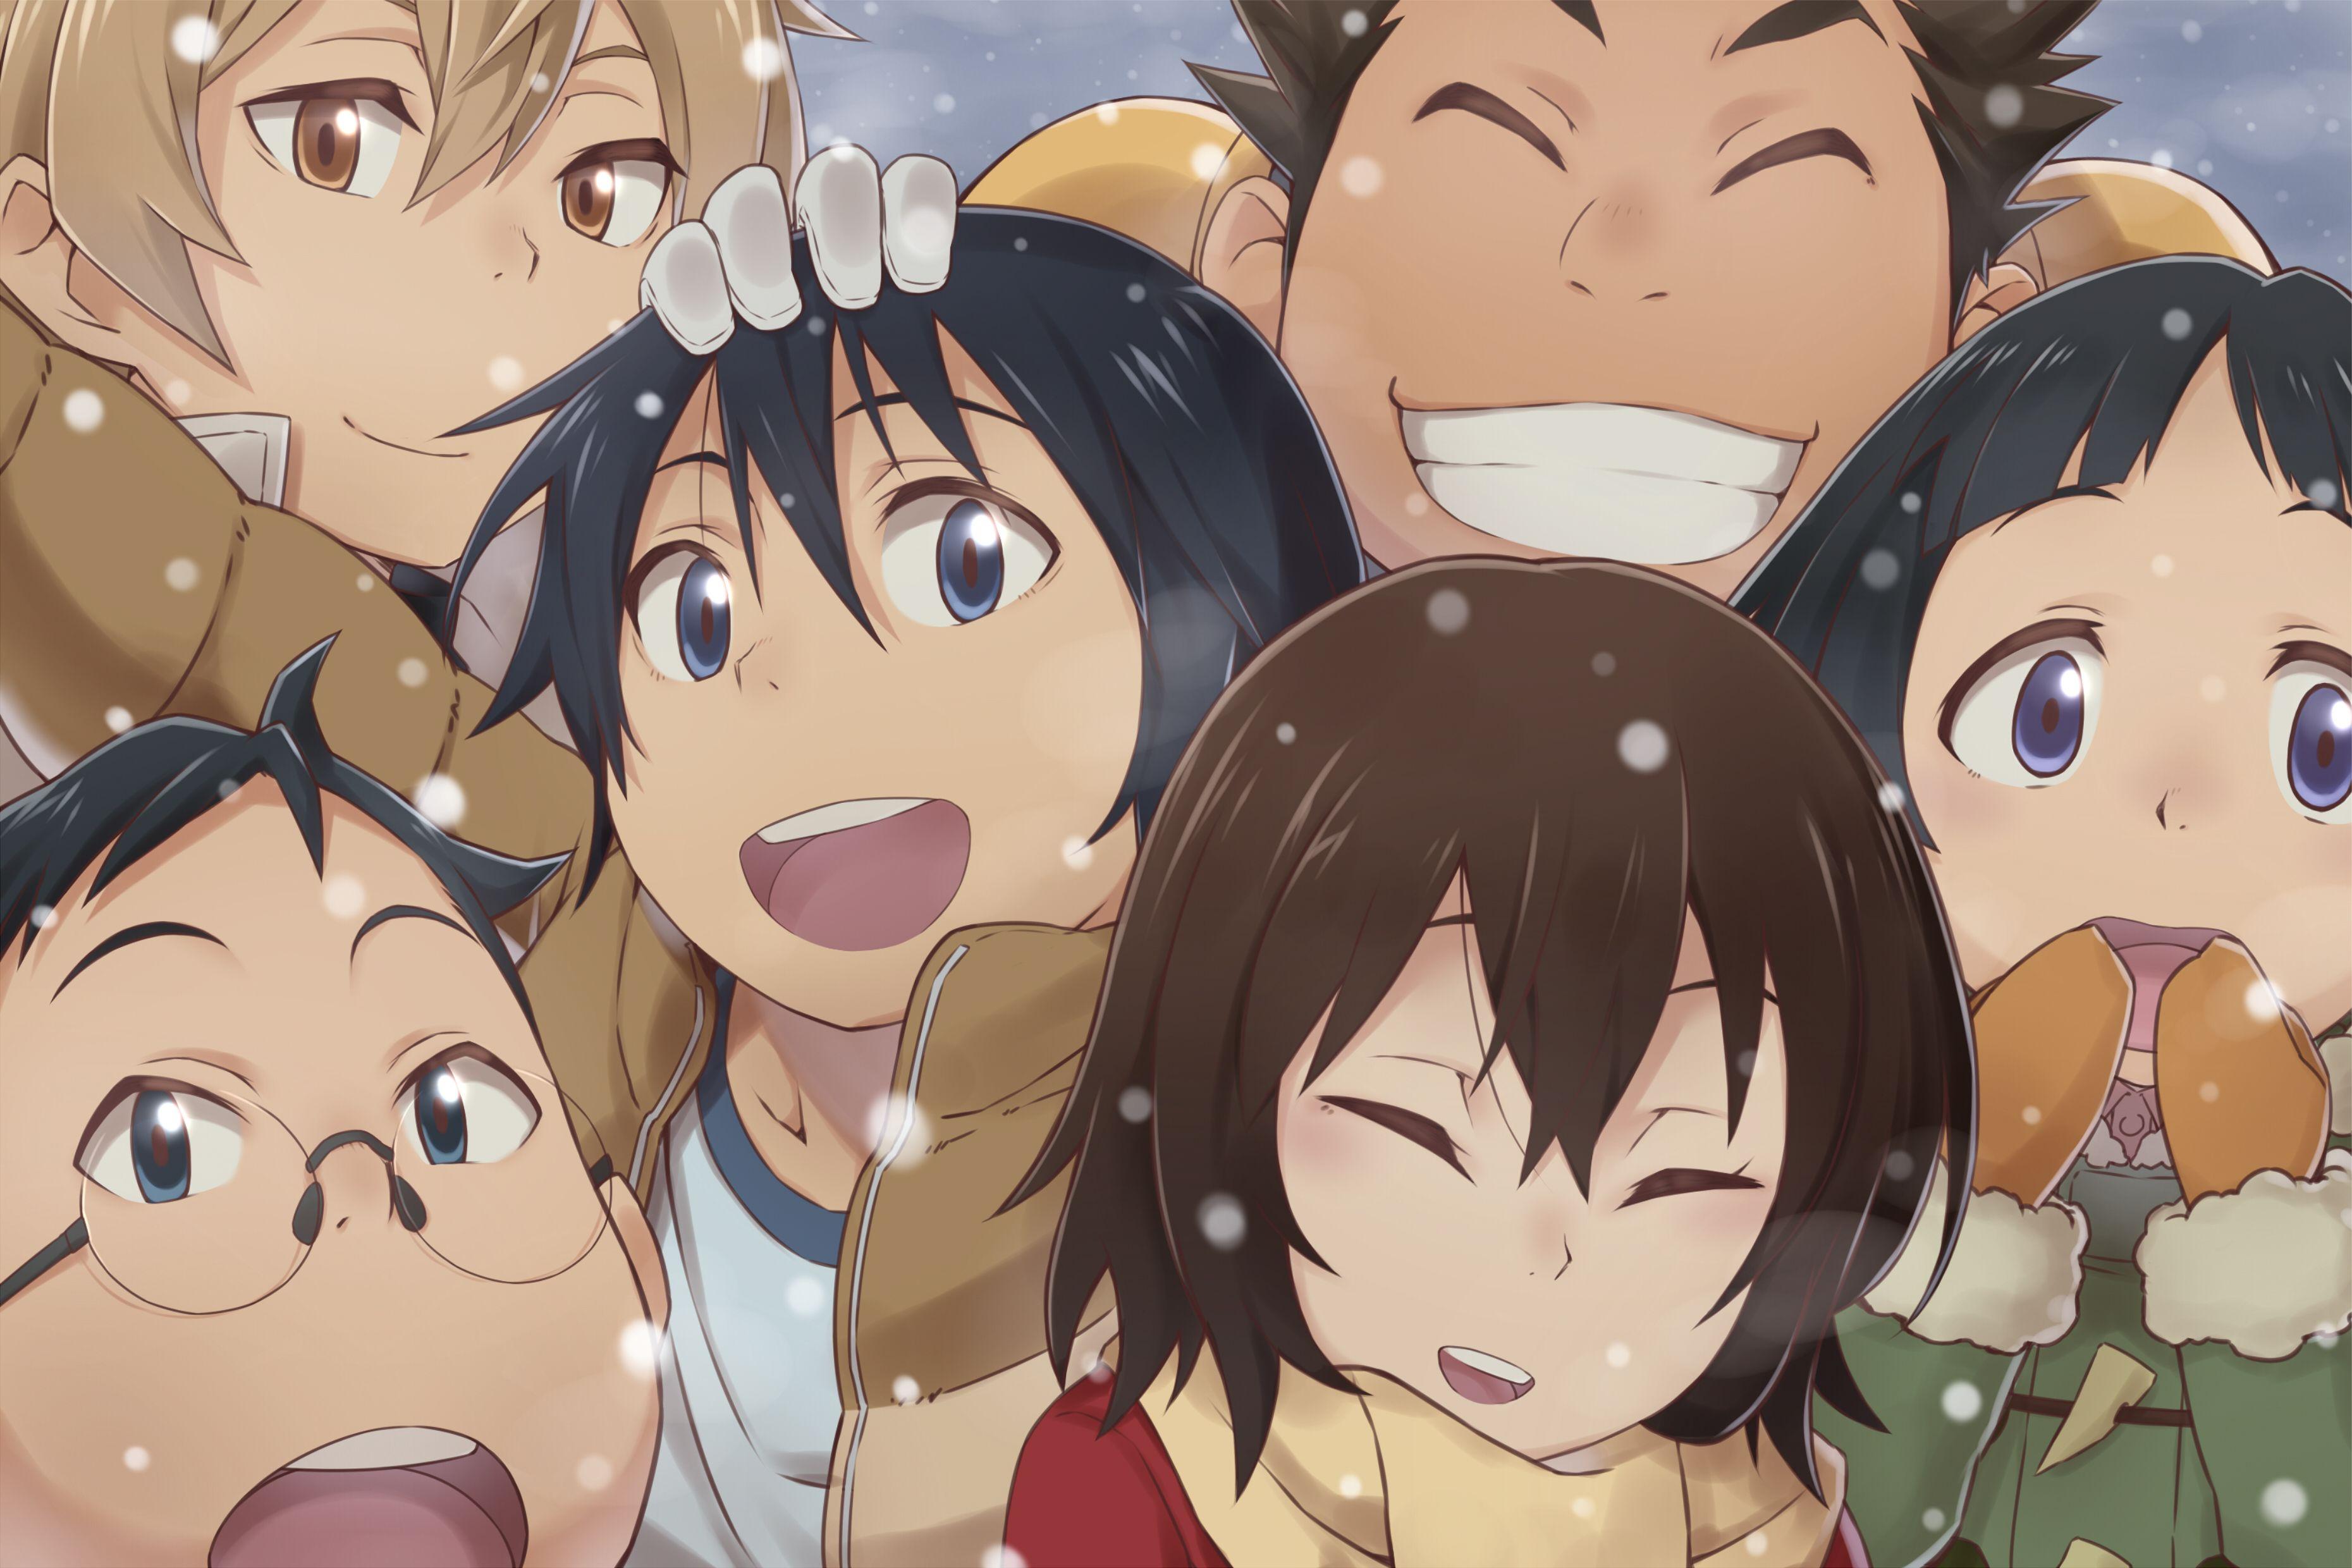 Boku Dake Ga Inai Machi Erased Satoru Fujinuma Kayo Hinazuki Kenya Hiromi Kazu Osamu Anime Anime Images Manga Anime